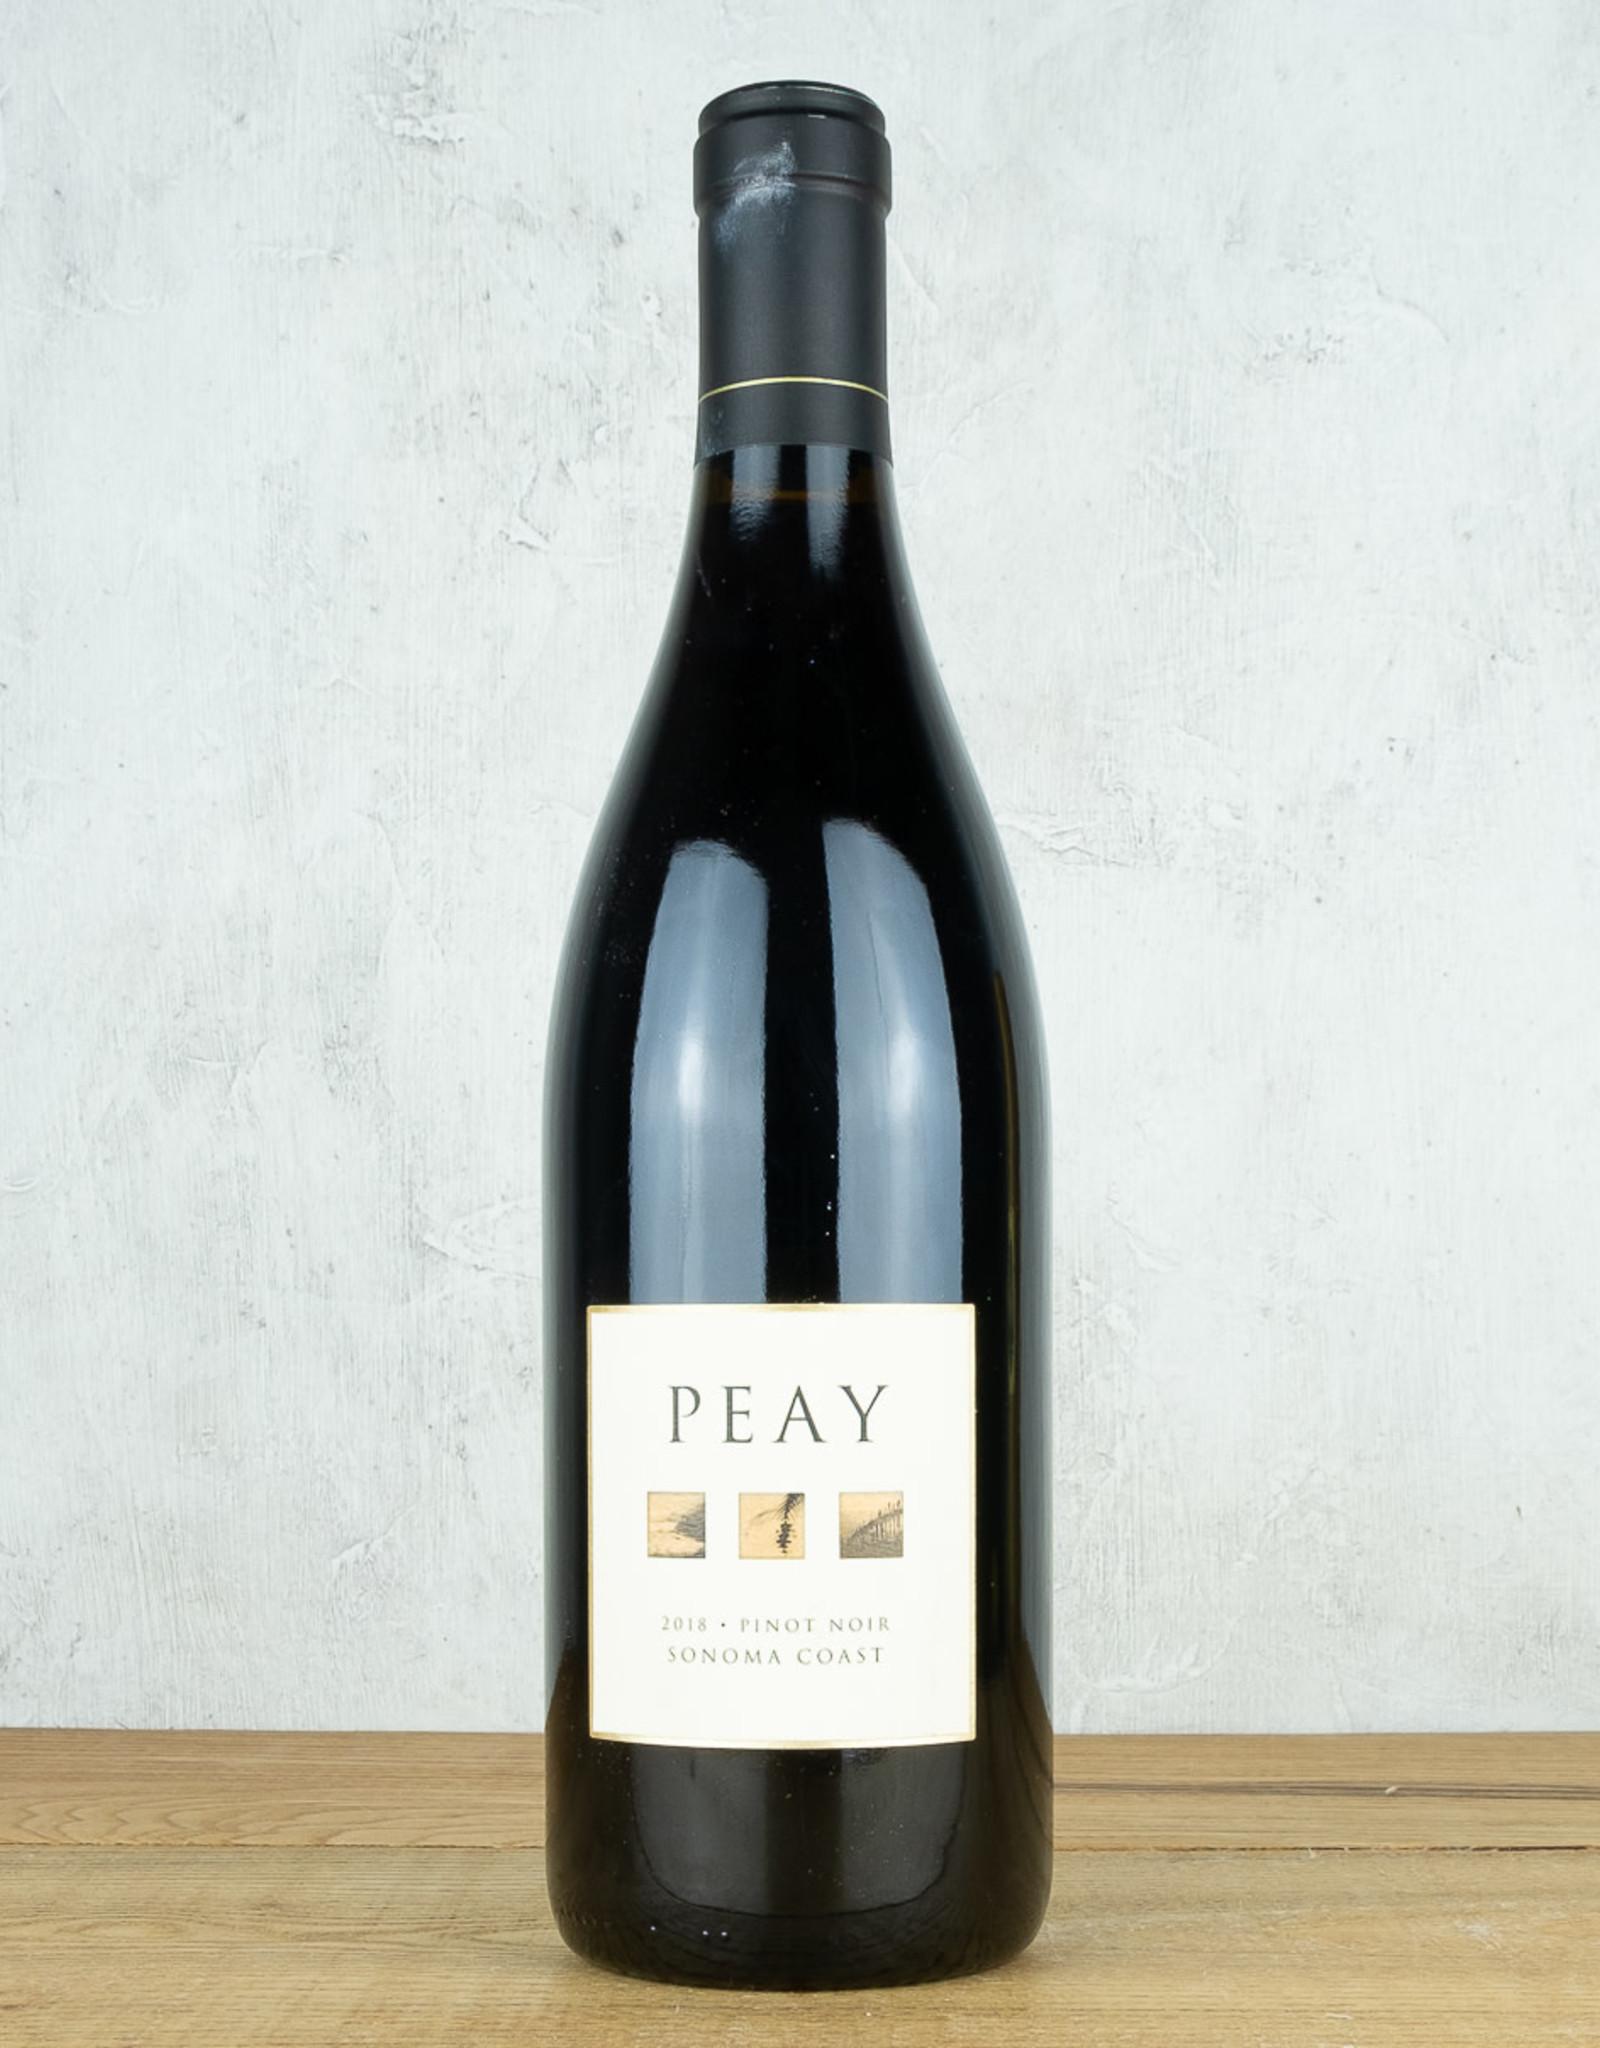 Peay Sonoma Coast Pinot Noir